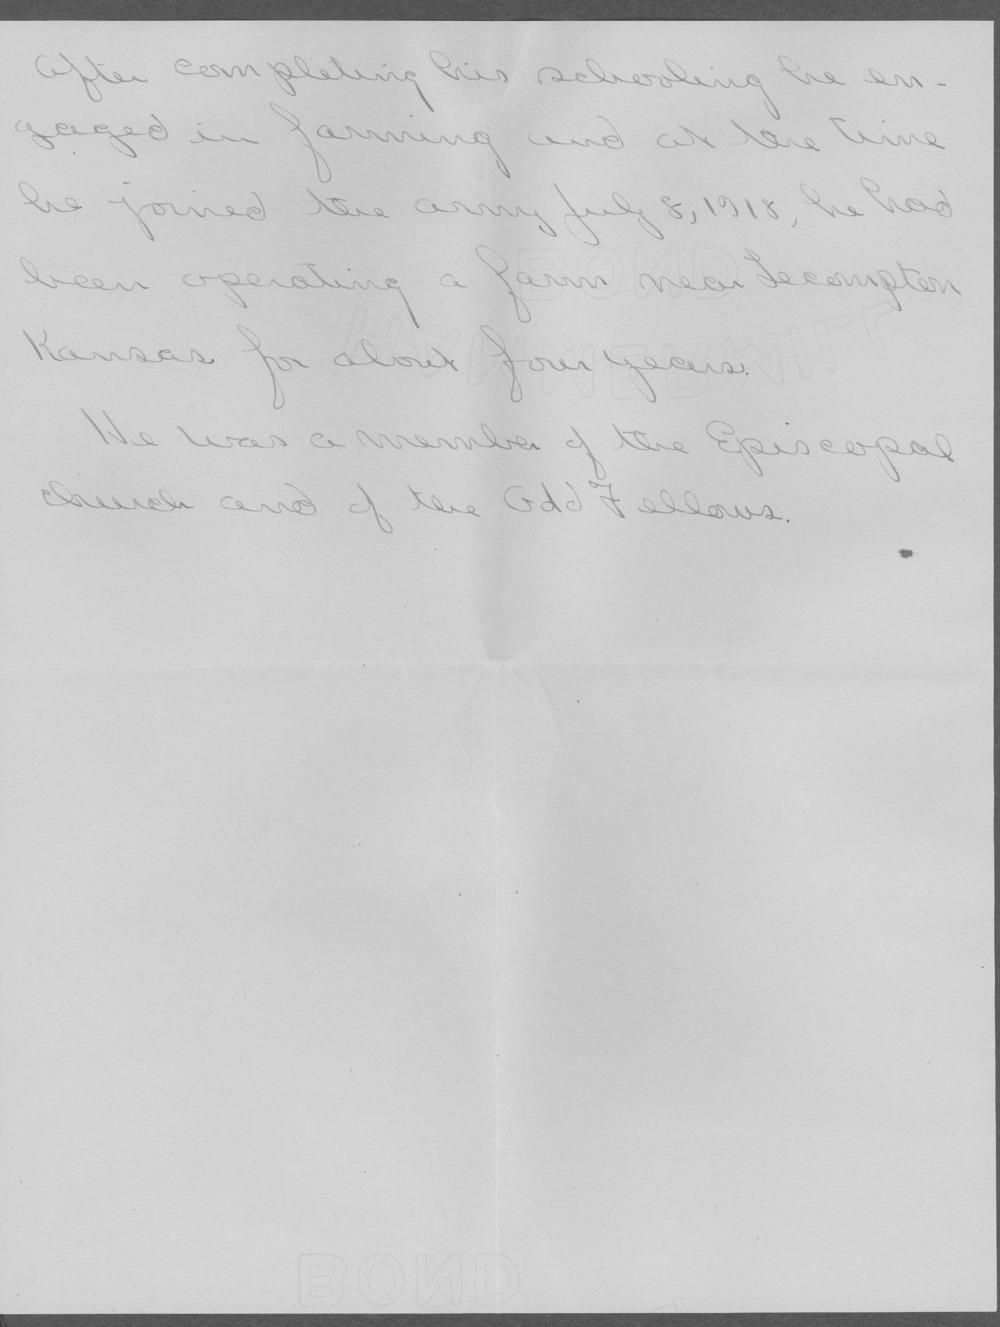 John Tupper, World War I soldier - 8